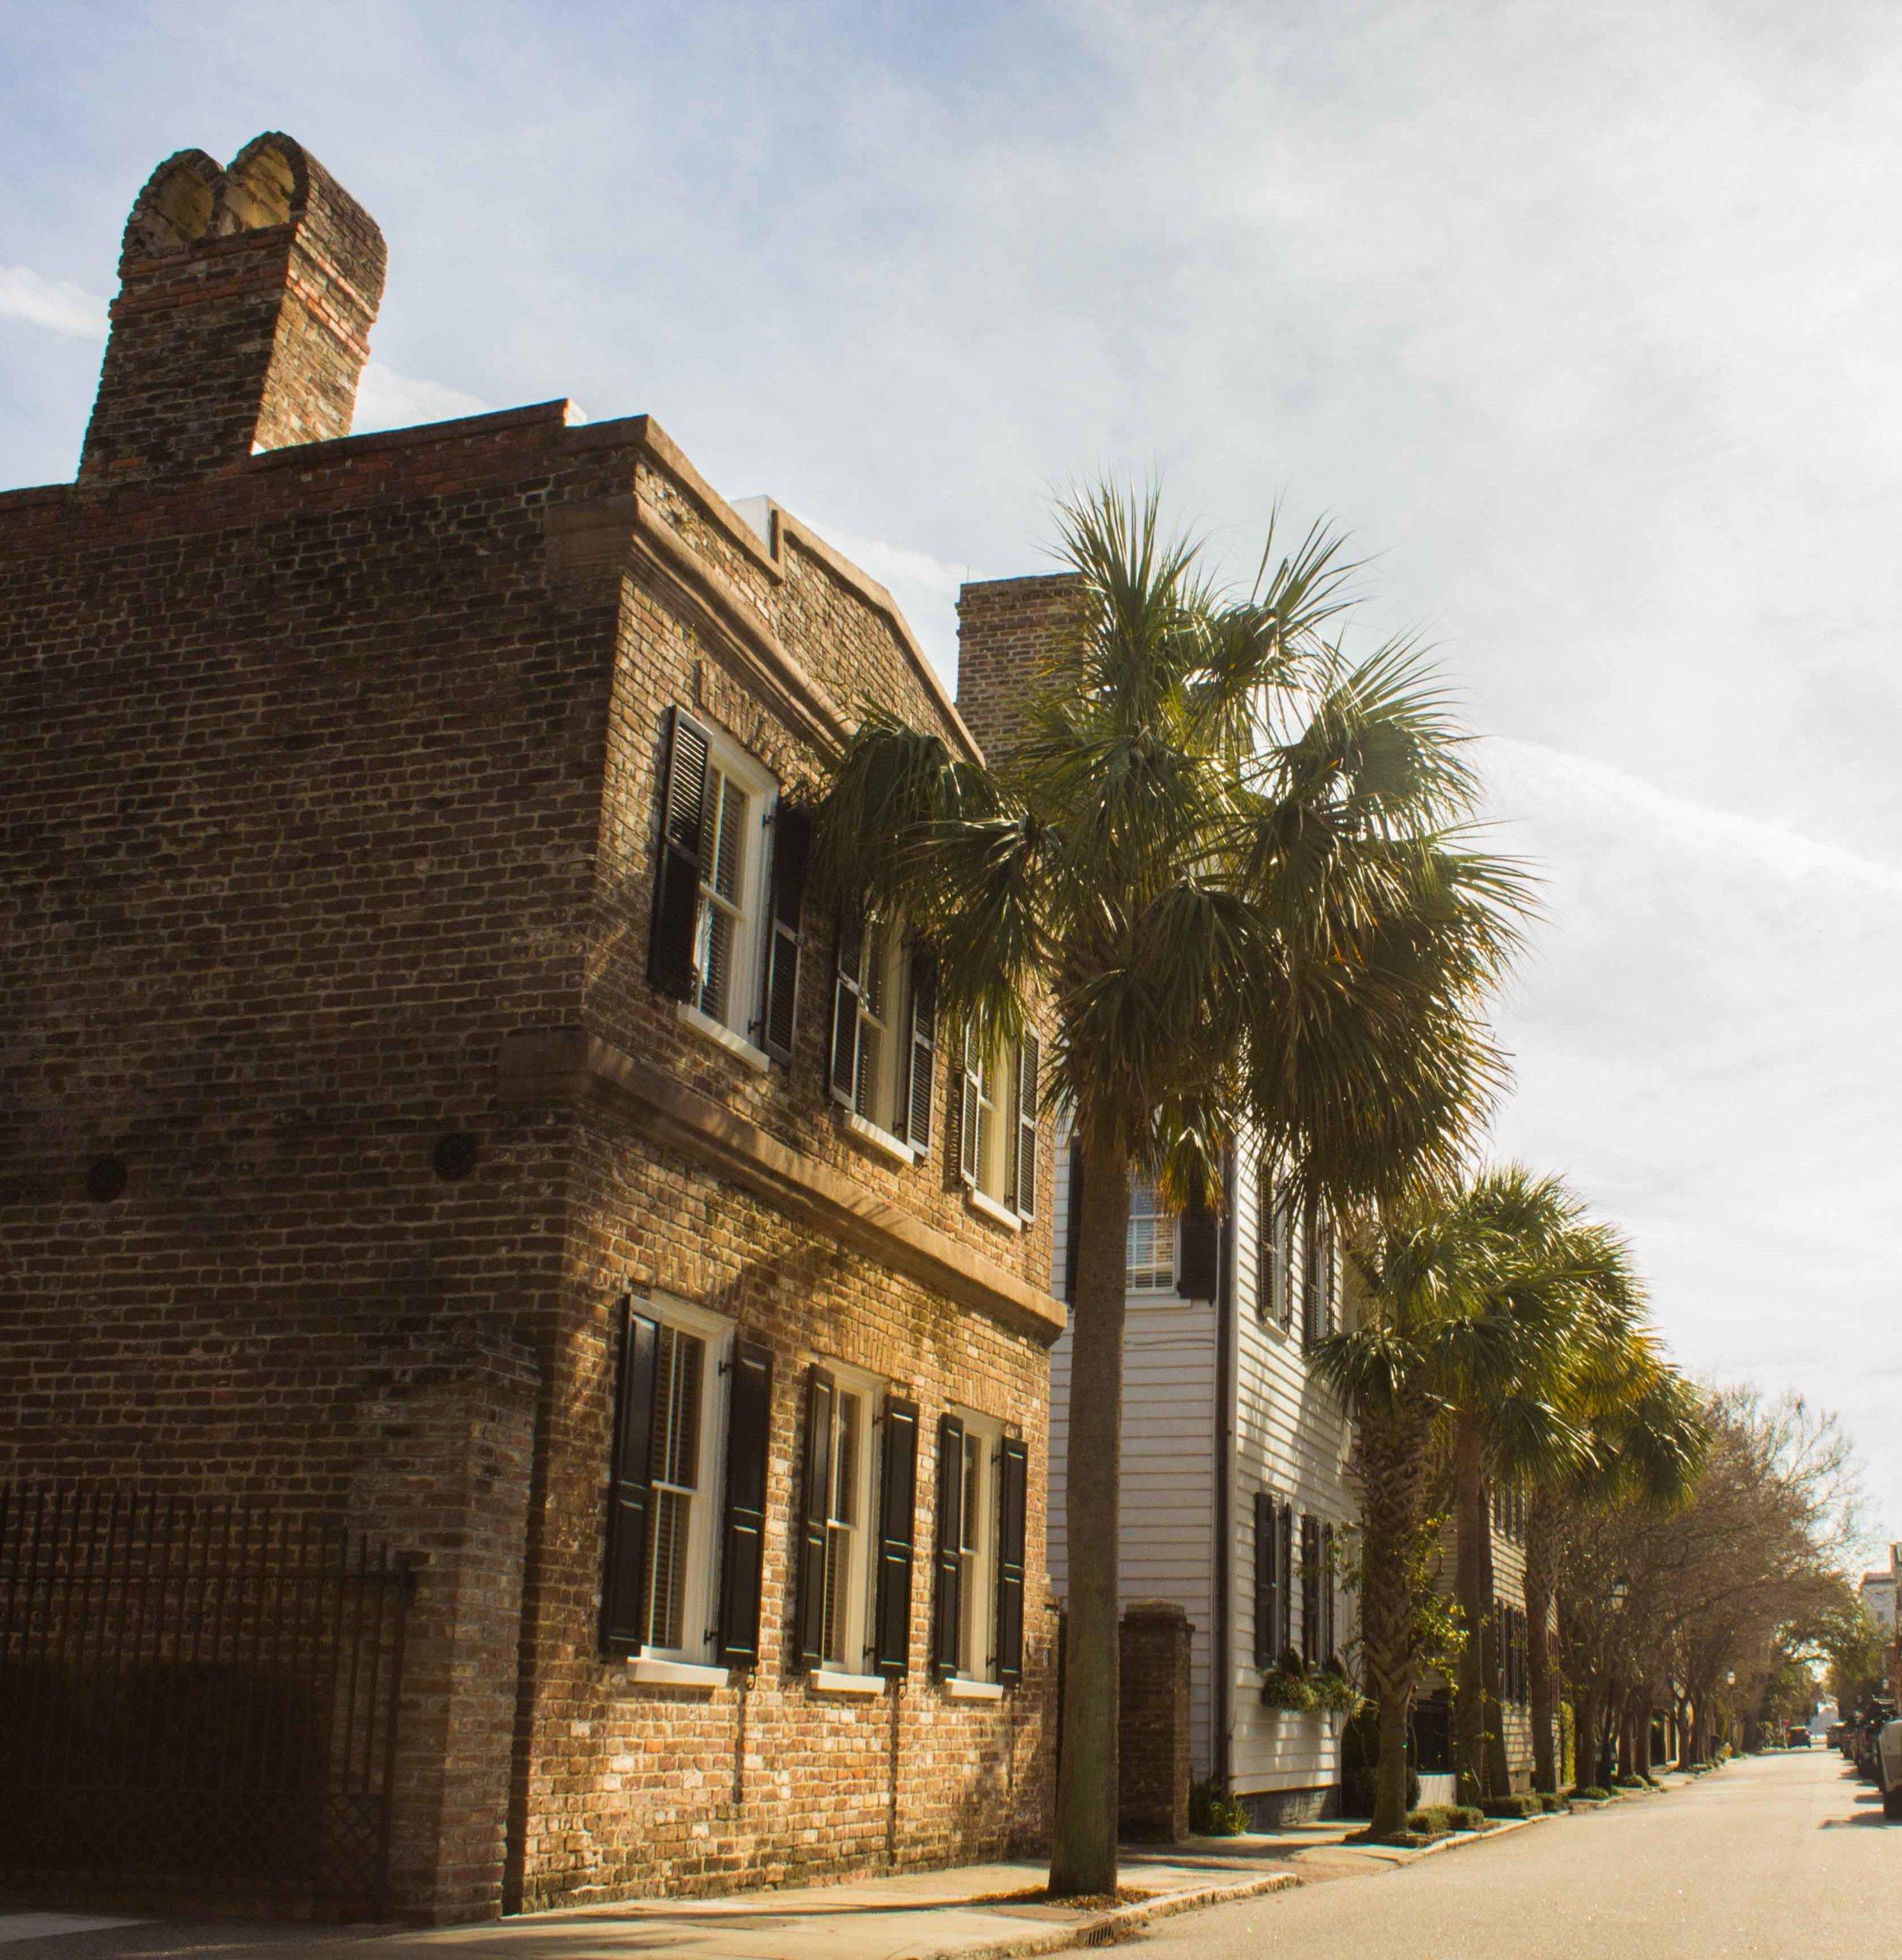 CharlestonIMG_8711.jpg